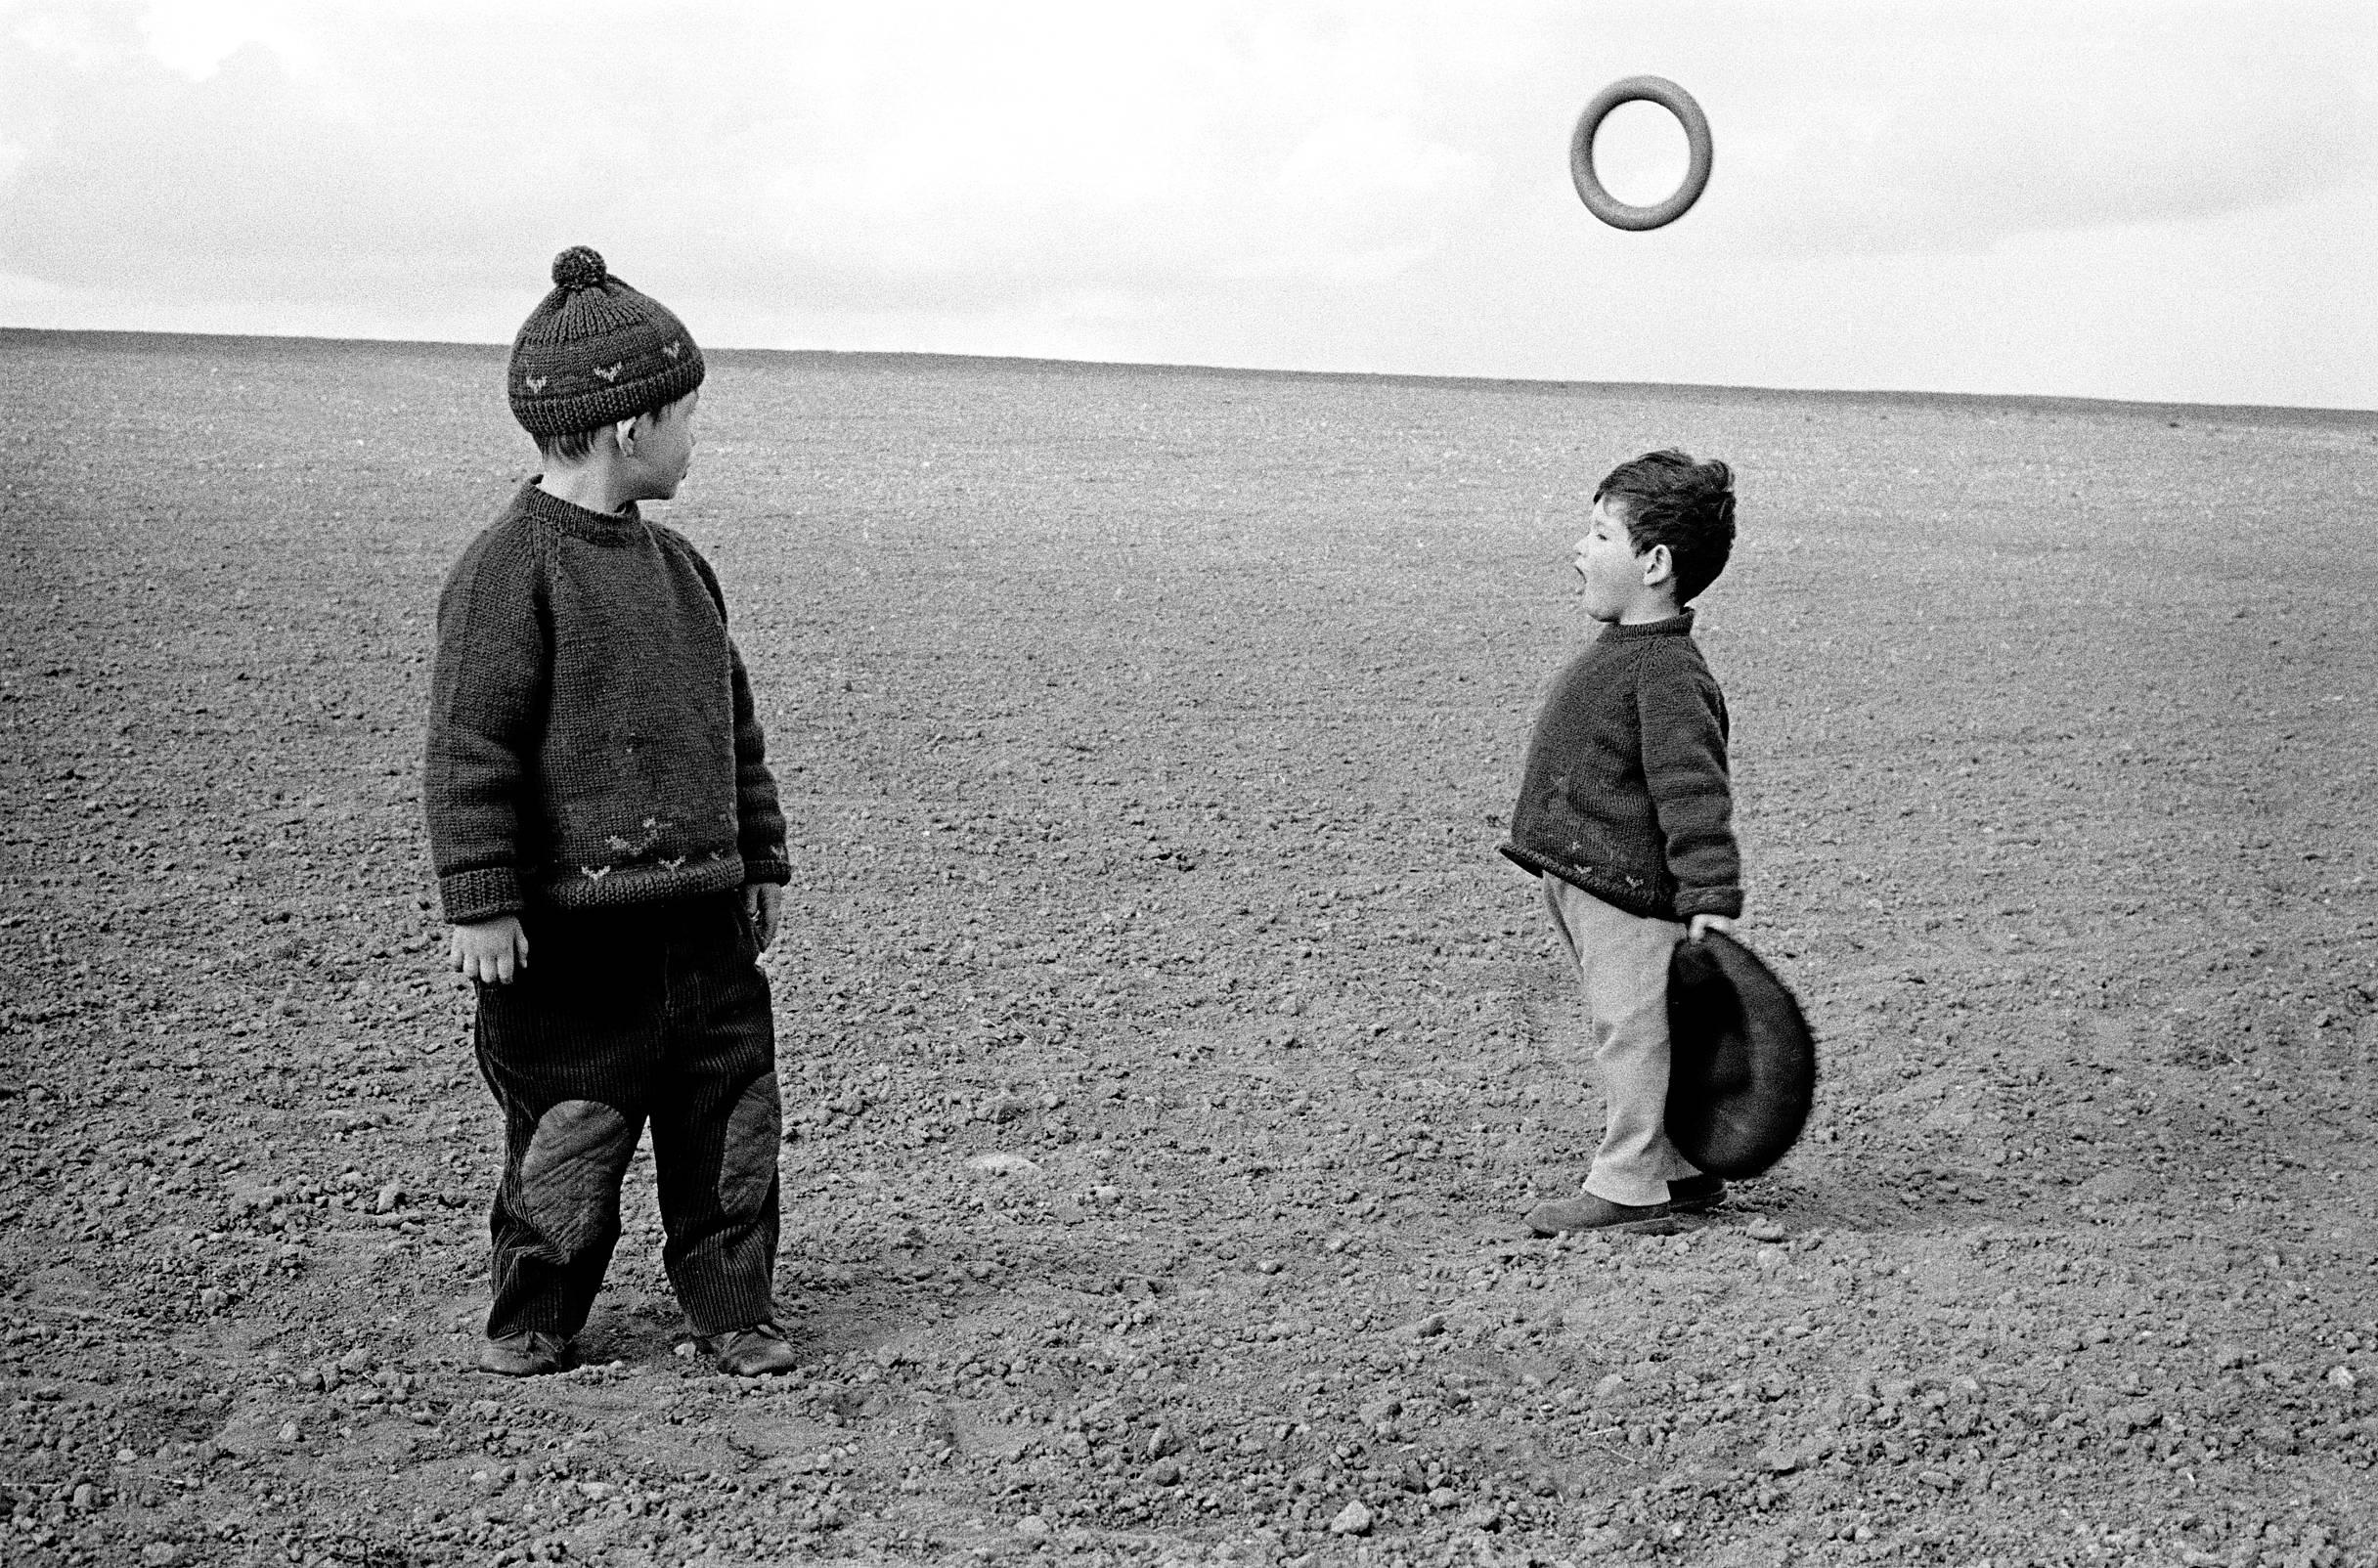 Fotó: Frank Horvat: 1959, near Paris, France, Michel and Lorenzo © Frank Horvat